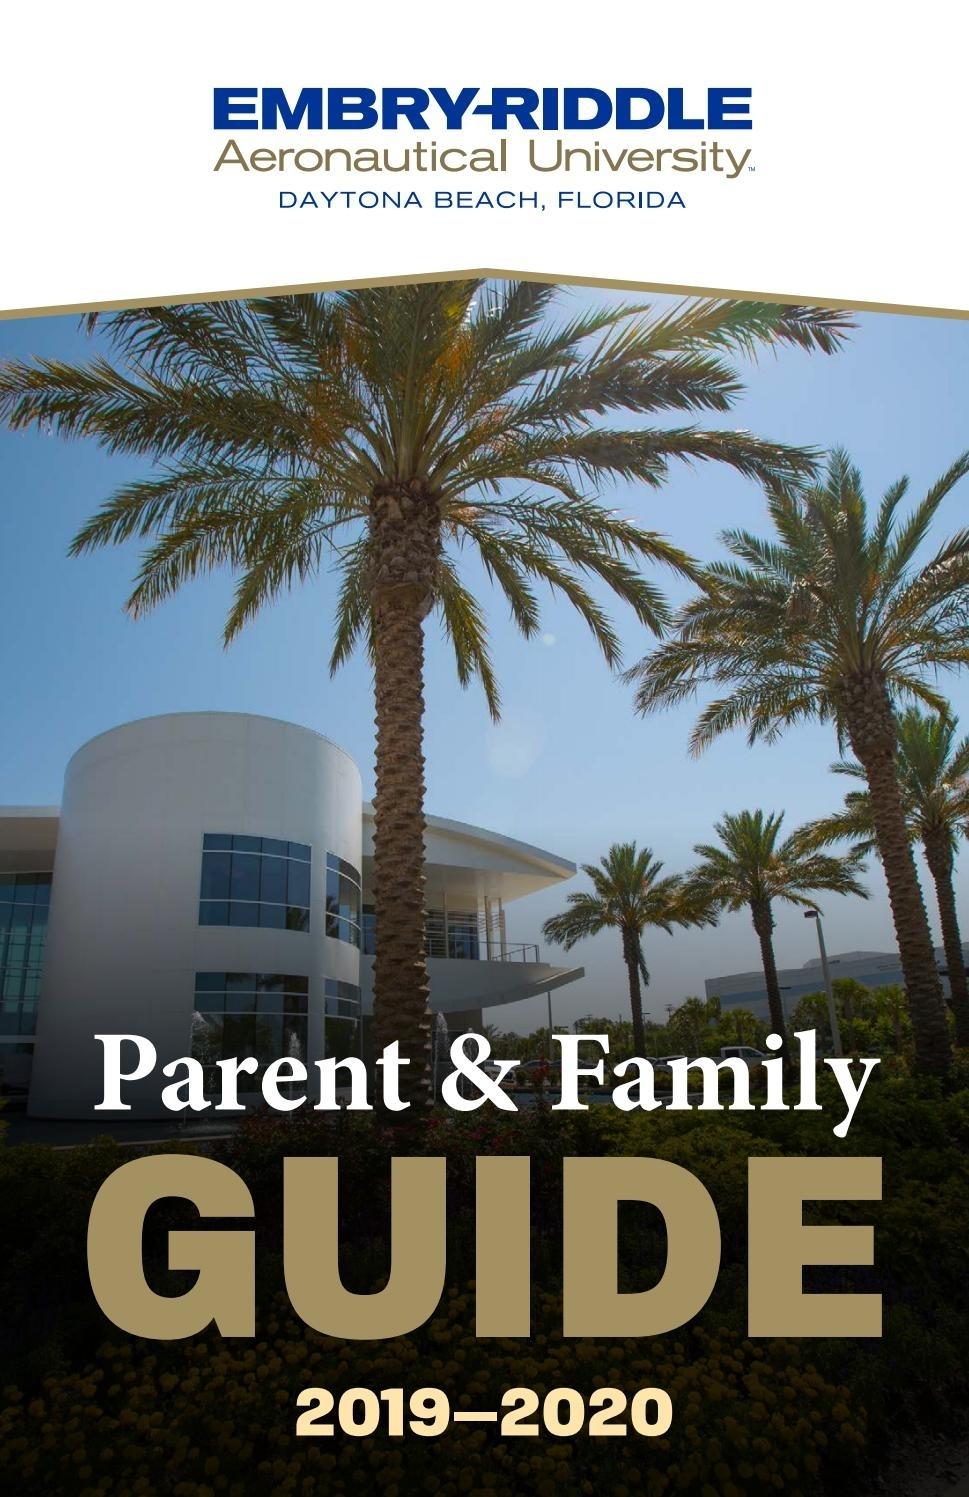 Embry-Riddle Aeronautical University Parent & Family Guide